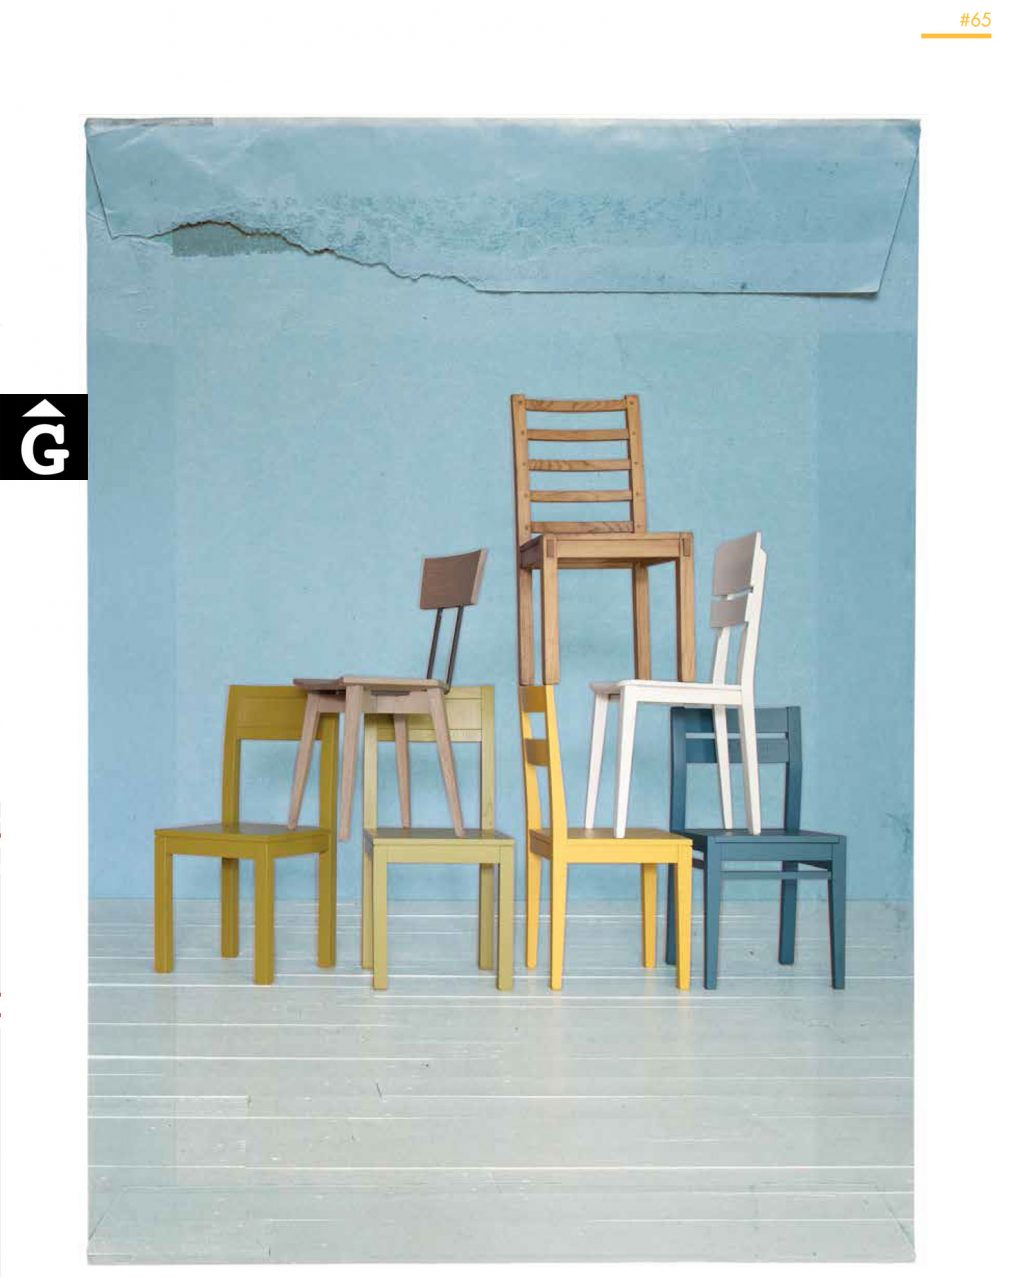 33-1-V-Taules-massisses-a-mida-experience-Mobles-Gifreu-&-Devina-Nais-collection-M15_catalogue-3